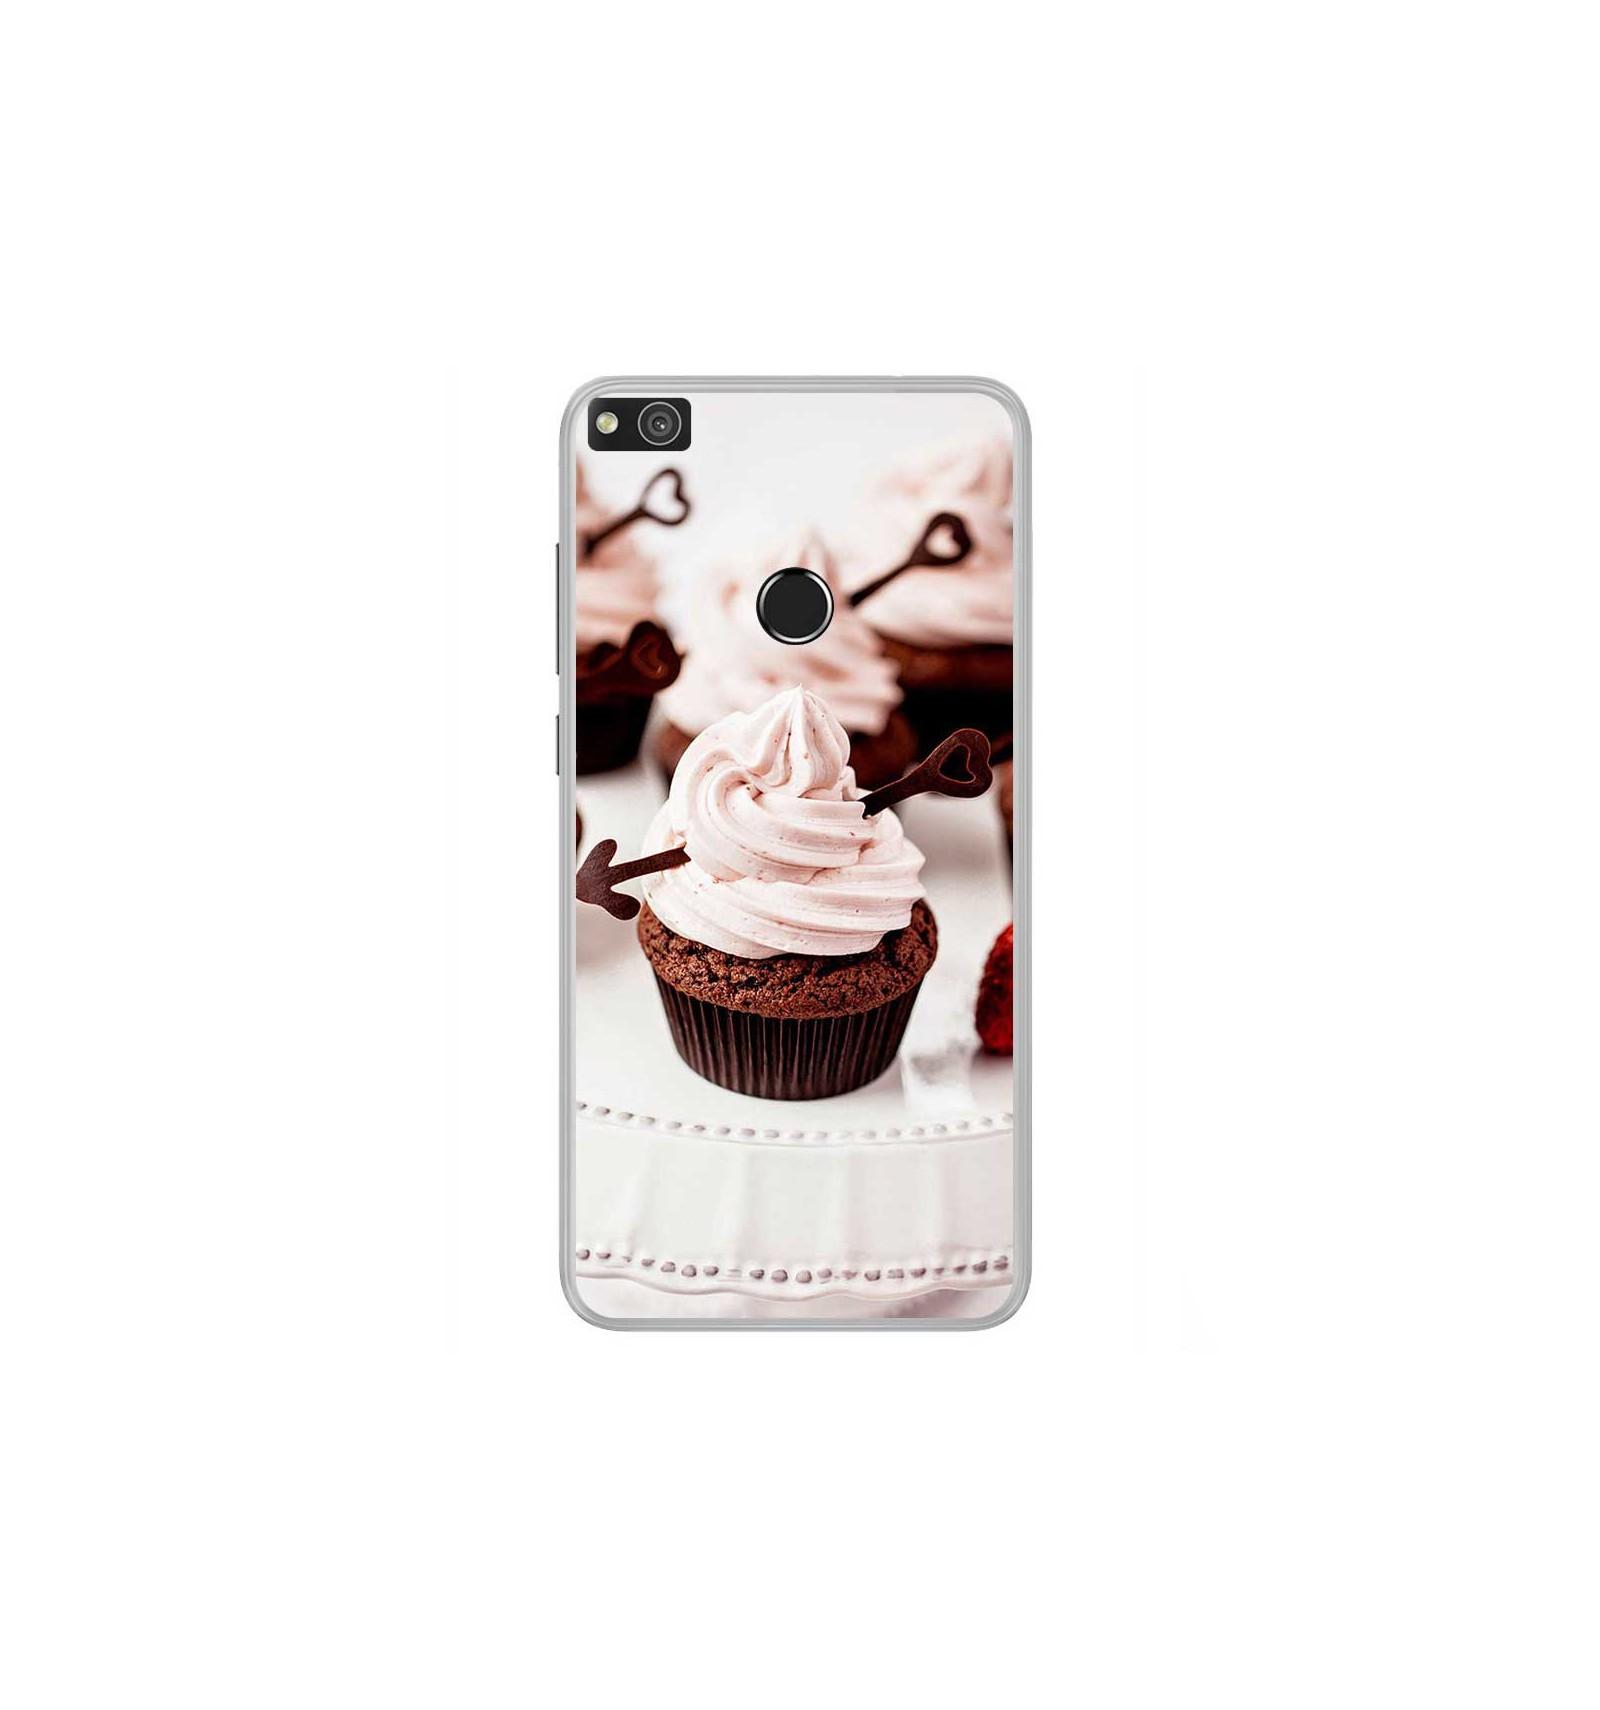 coque huawei p8 lite cupcake